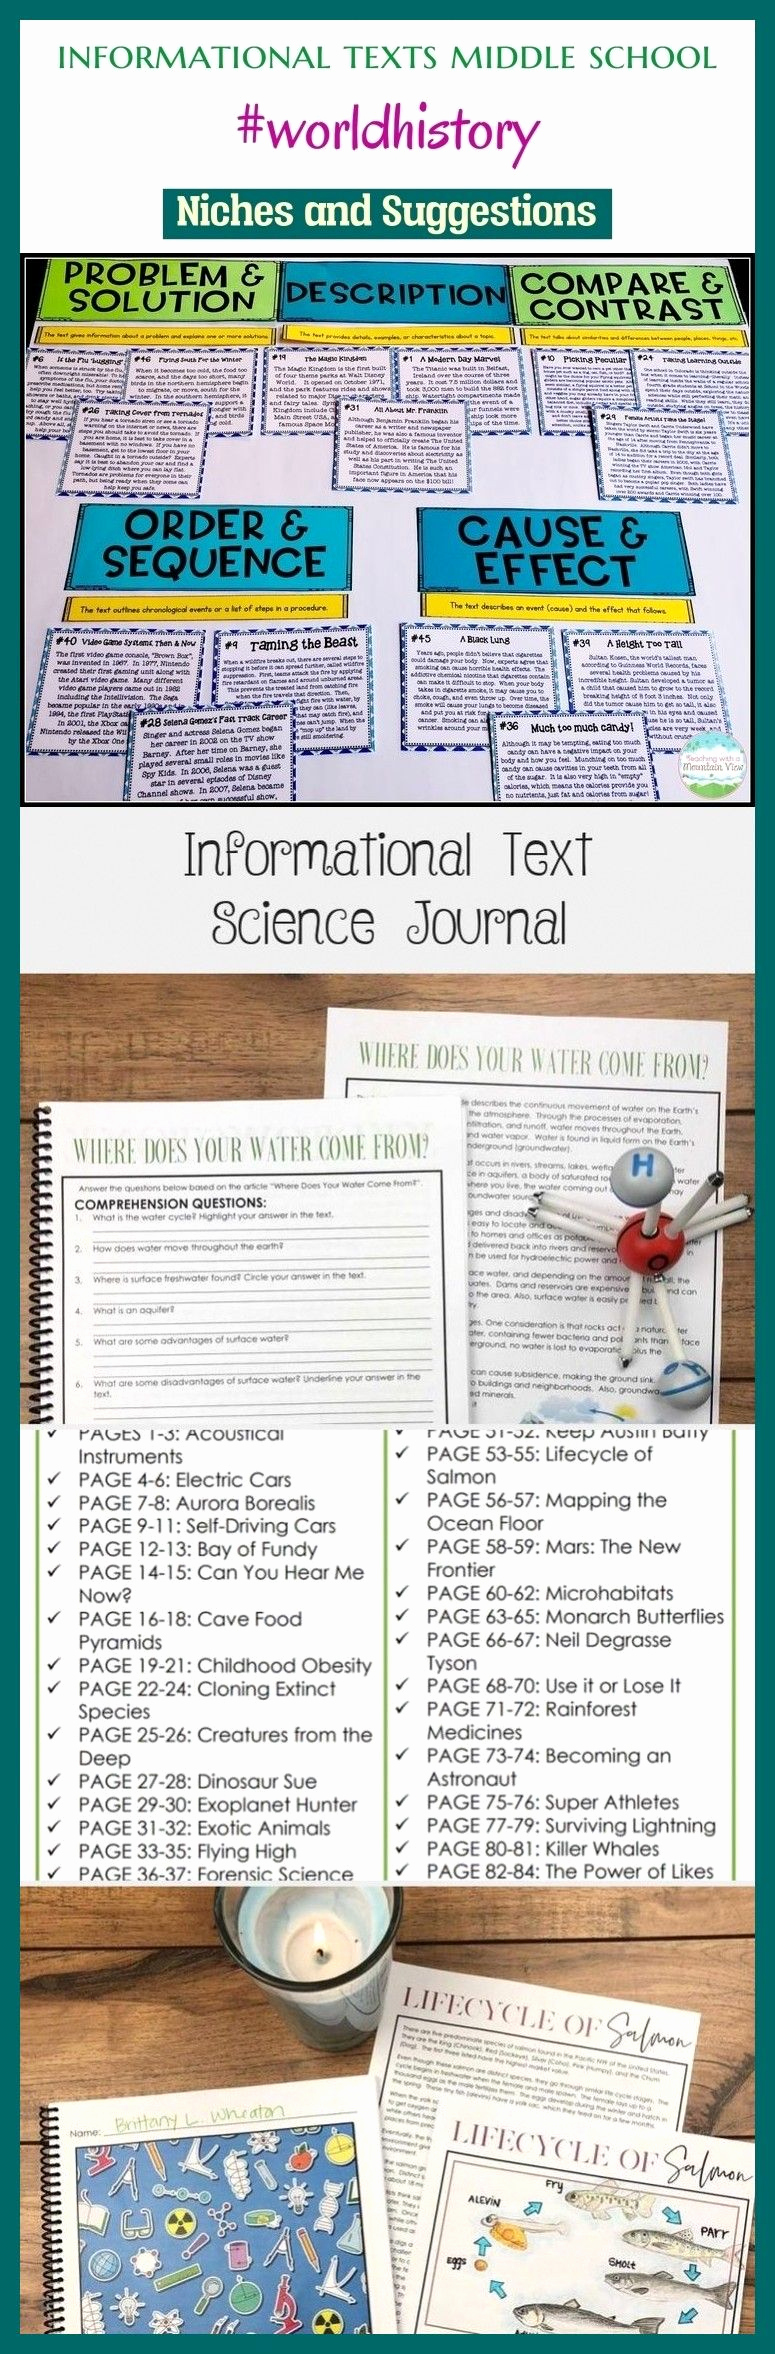 Informational Text Worksheets Middle School Awesome Informational Texts Middle School Worldhistory Keywords